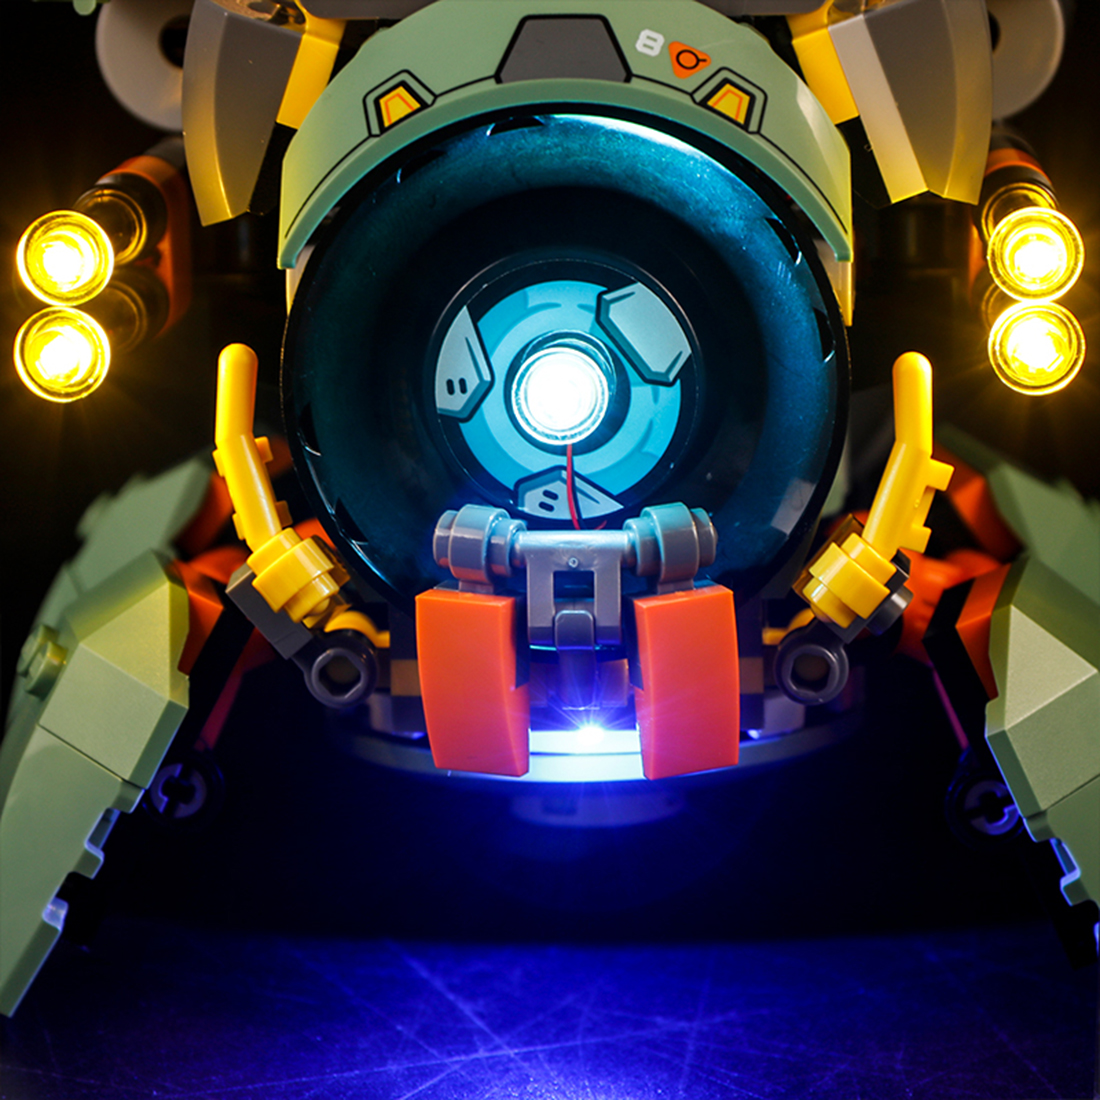 Vonado USB LED Lighting Kit For Overwatch Wrecking Ball 75976(LED Included Only, No Kit) Toy For Children Educational Toys Gift 1